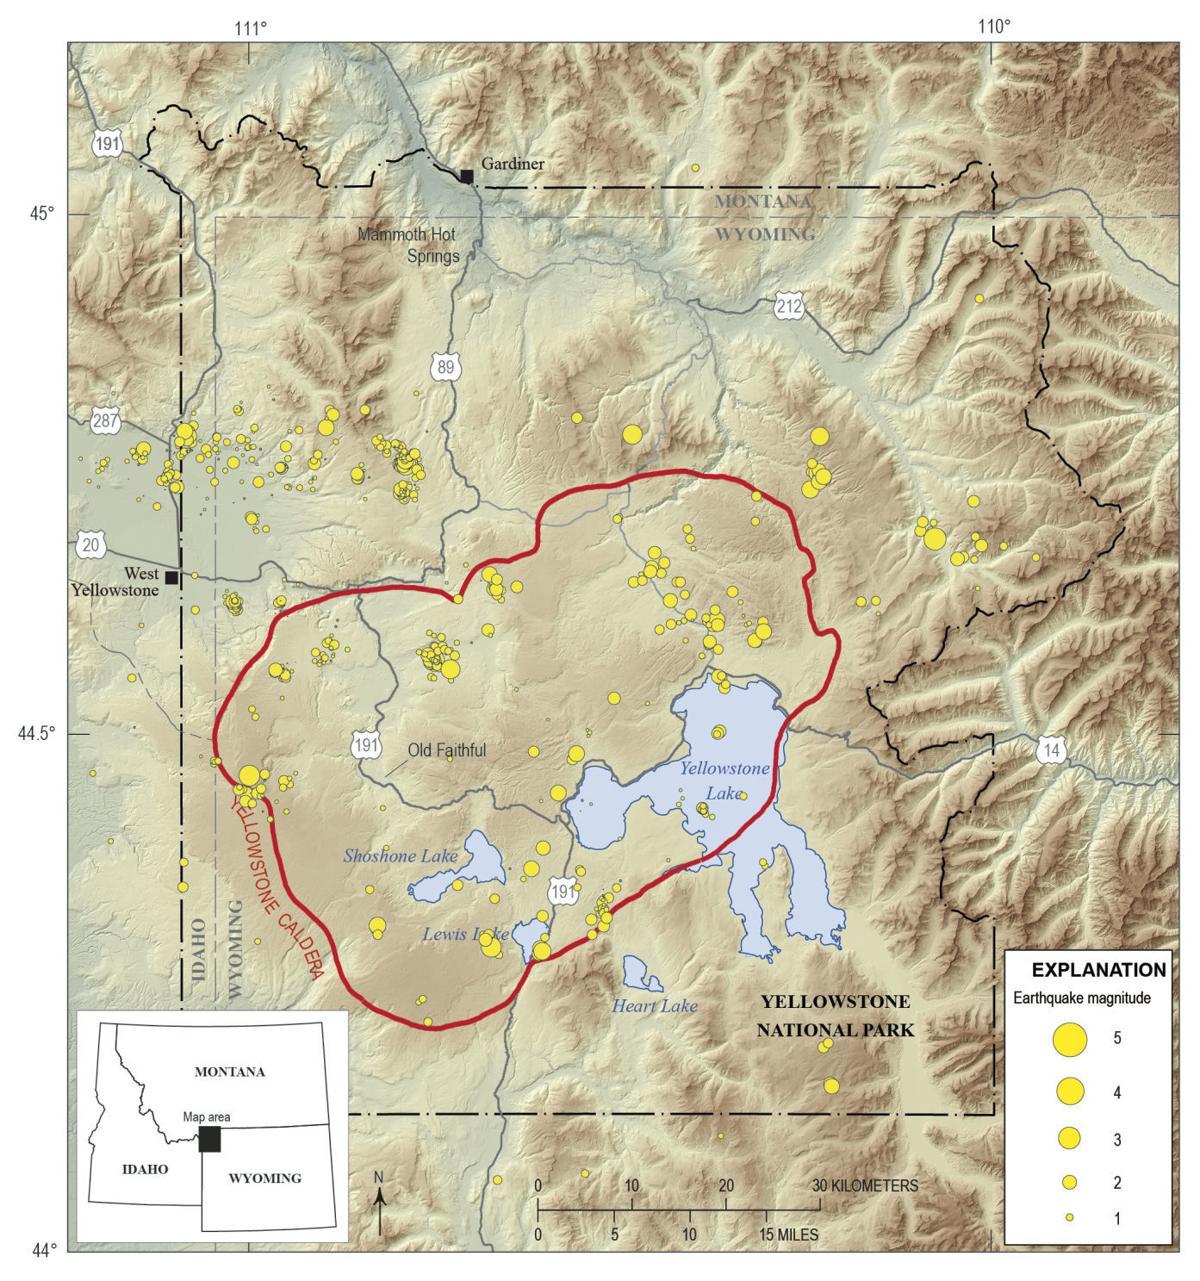 Yellowstone seismicity